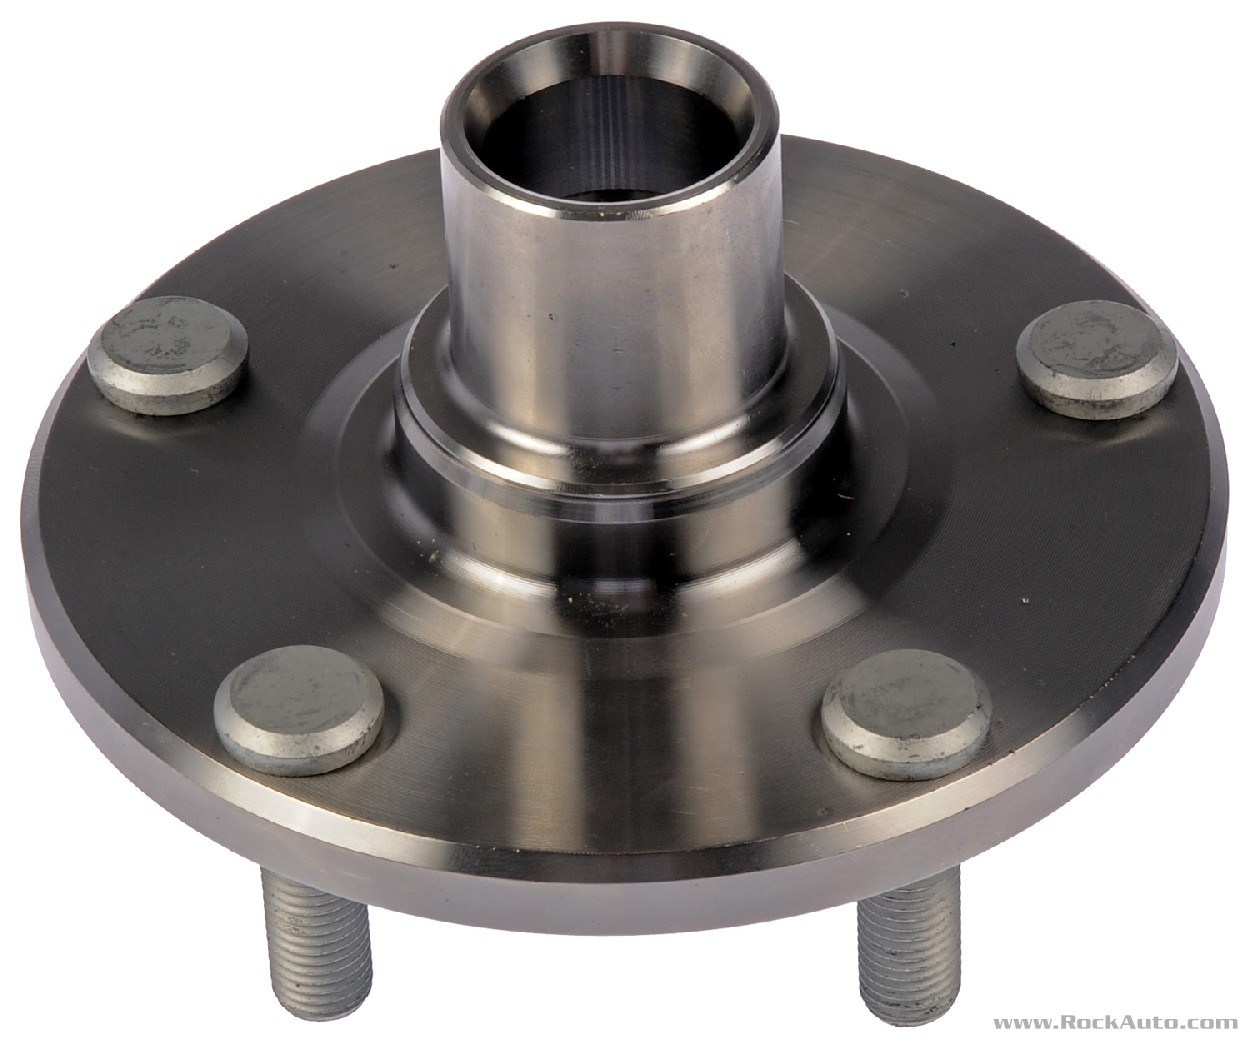 High Quality Auto Wheel Hub Bearing for Front RAV4 2.0L 43502-42010